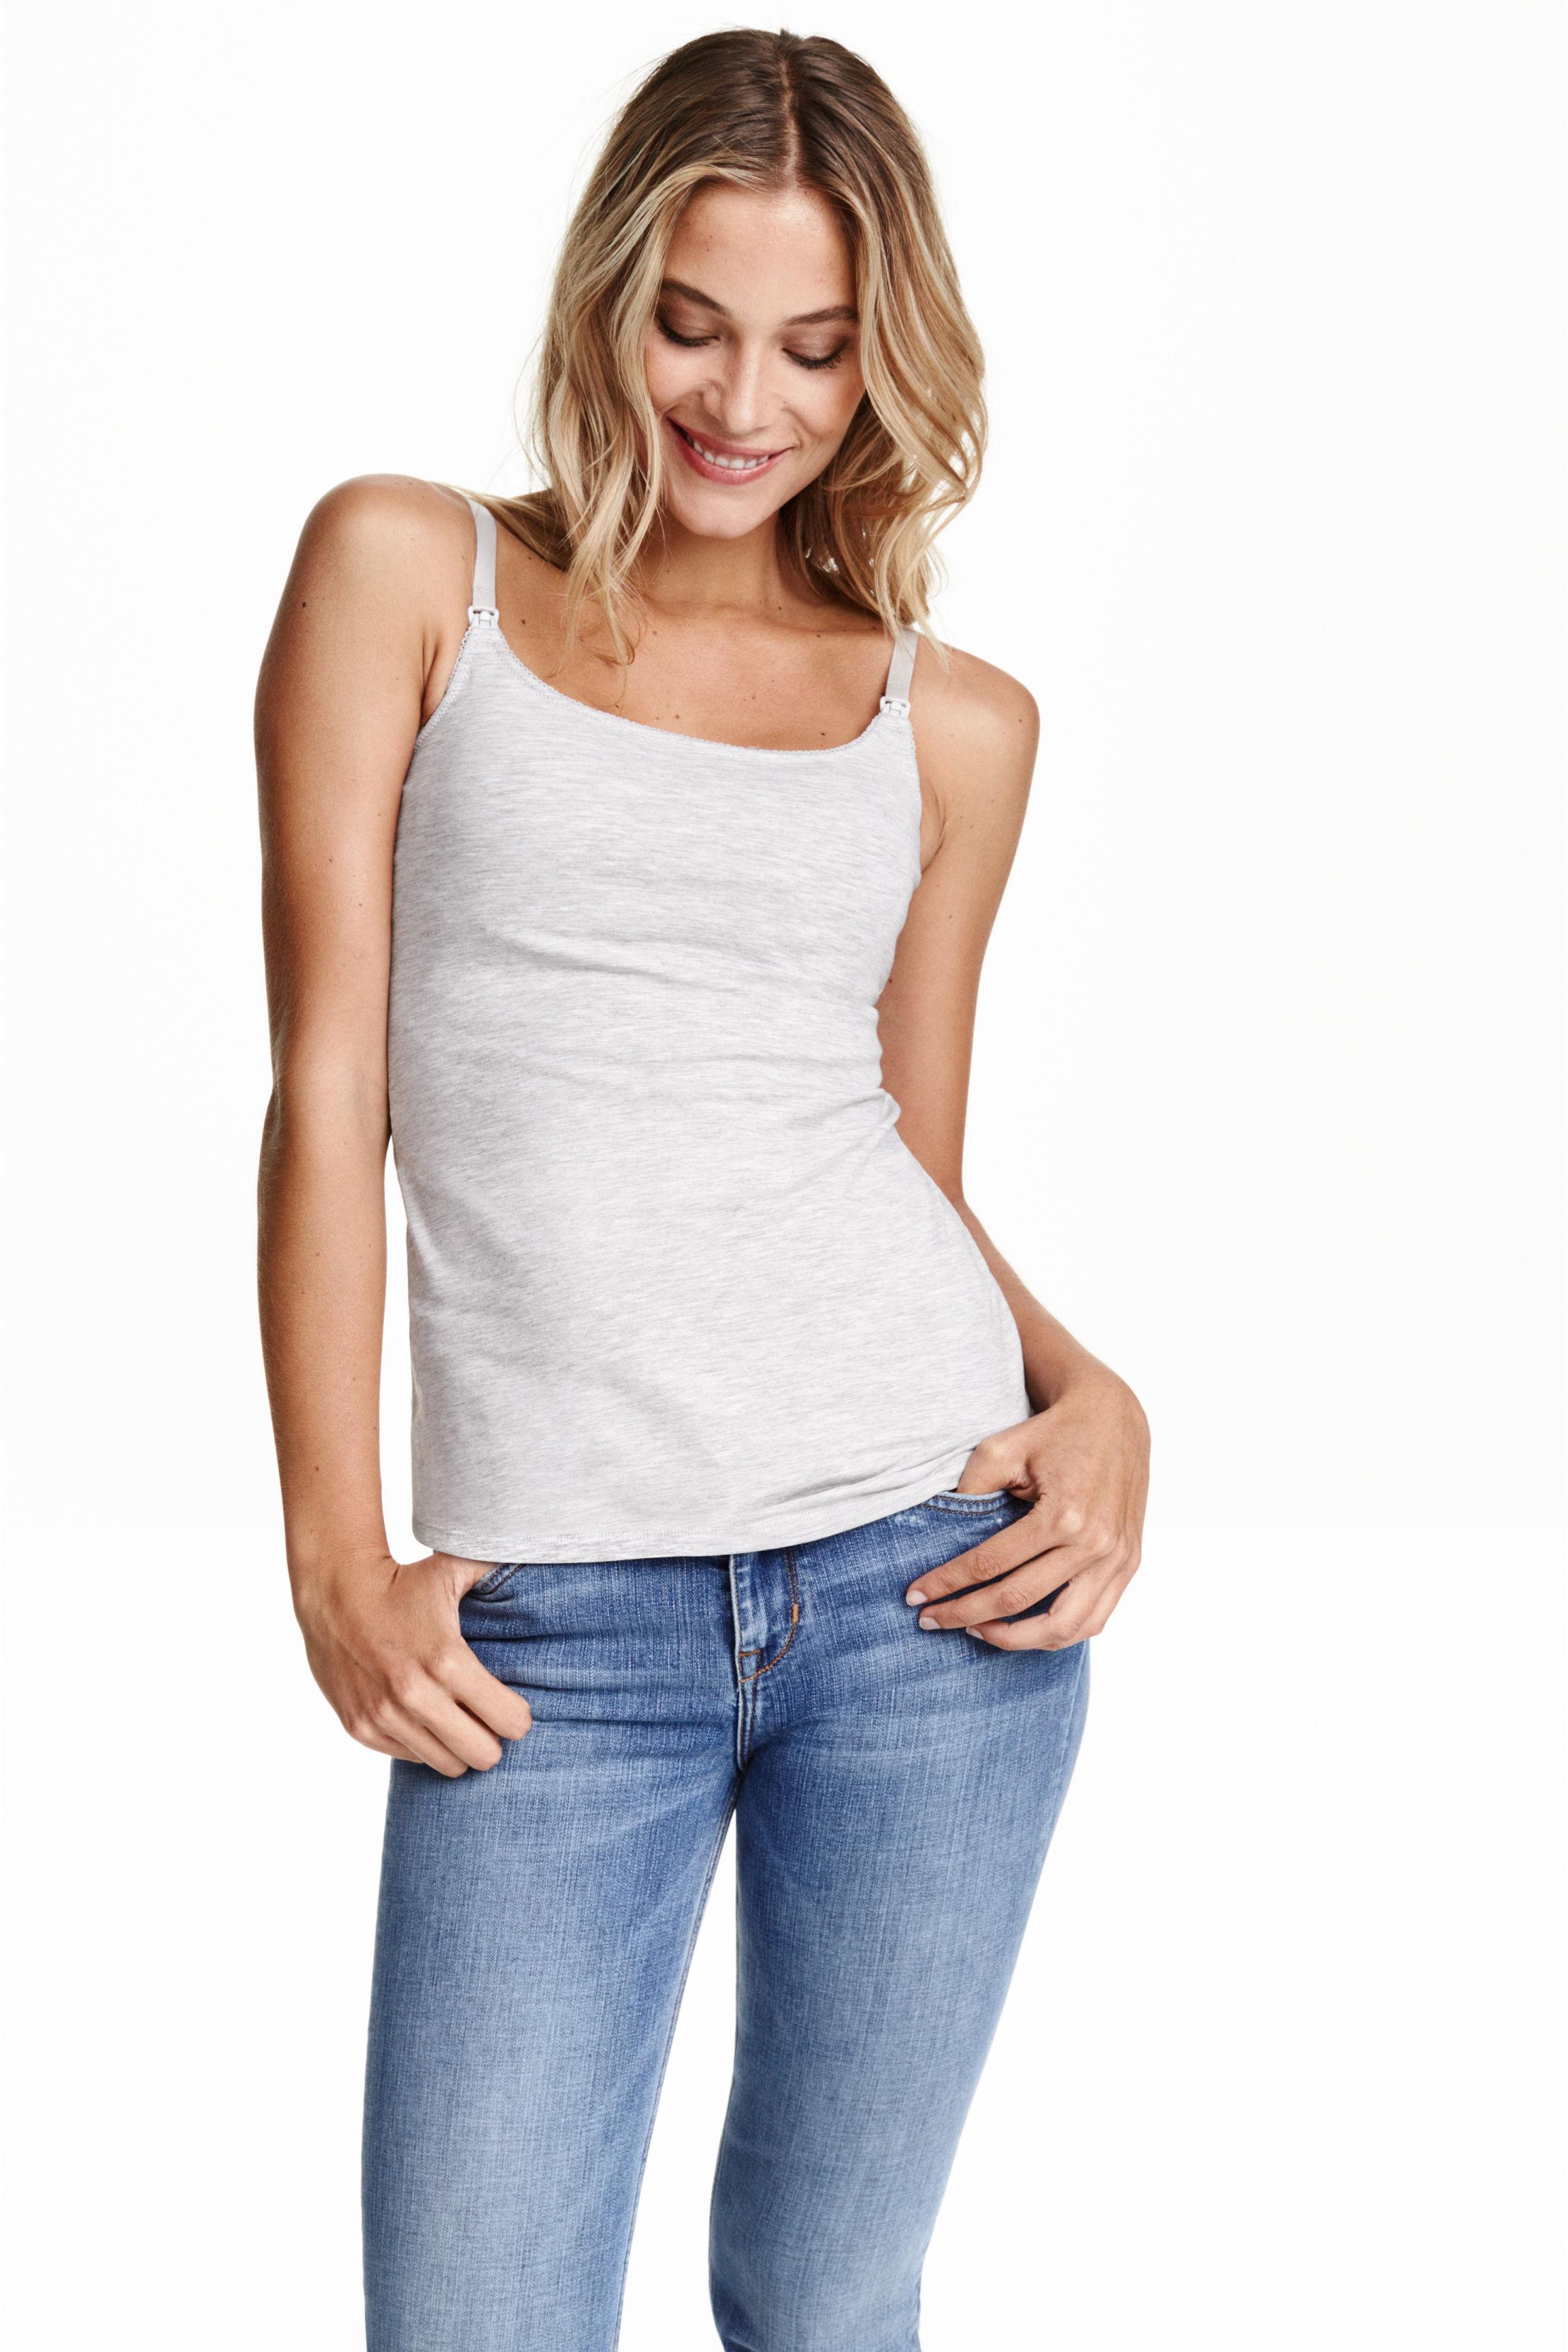 MAMA 2-pack nursing tops - White/Black - Ladies | H&M GB